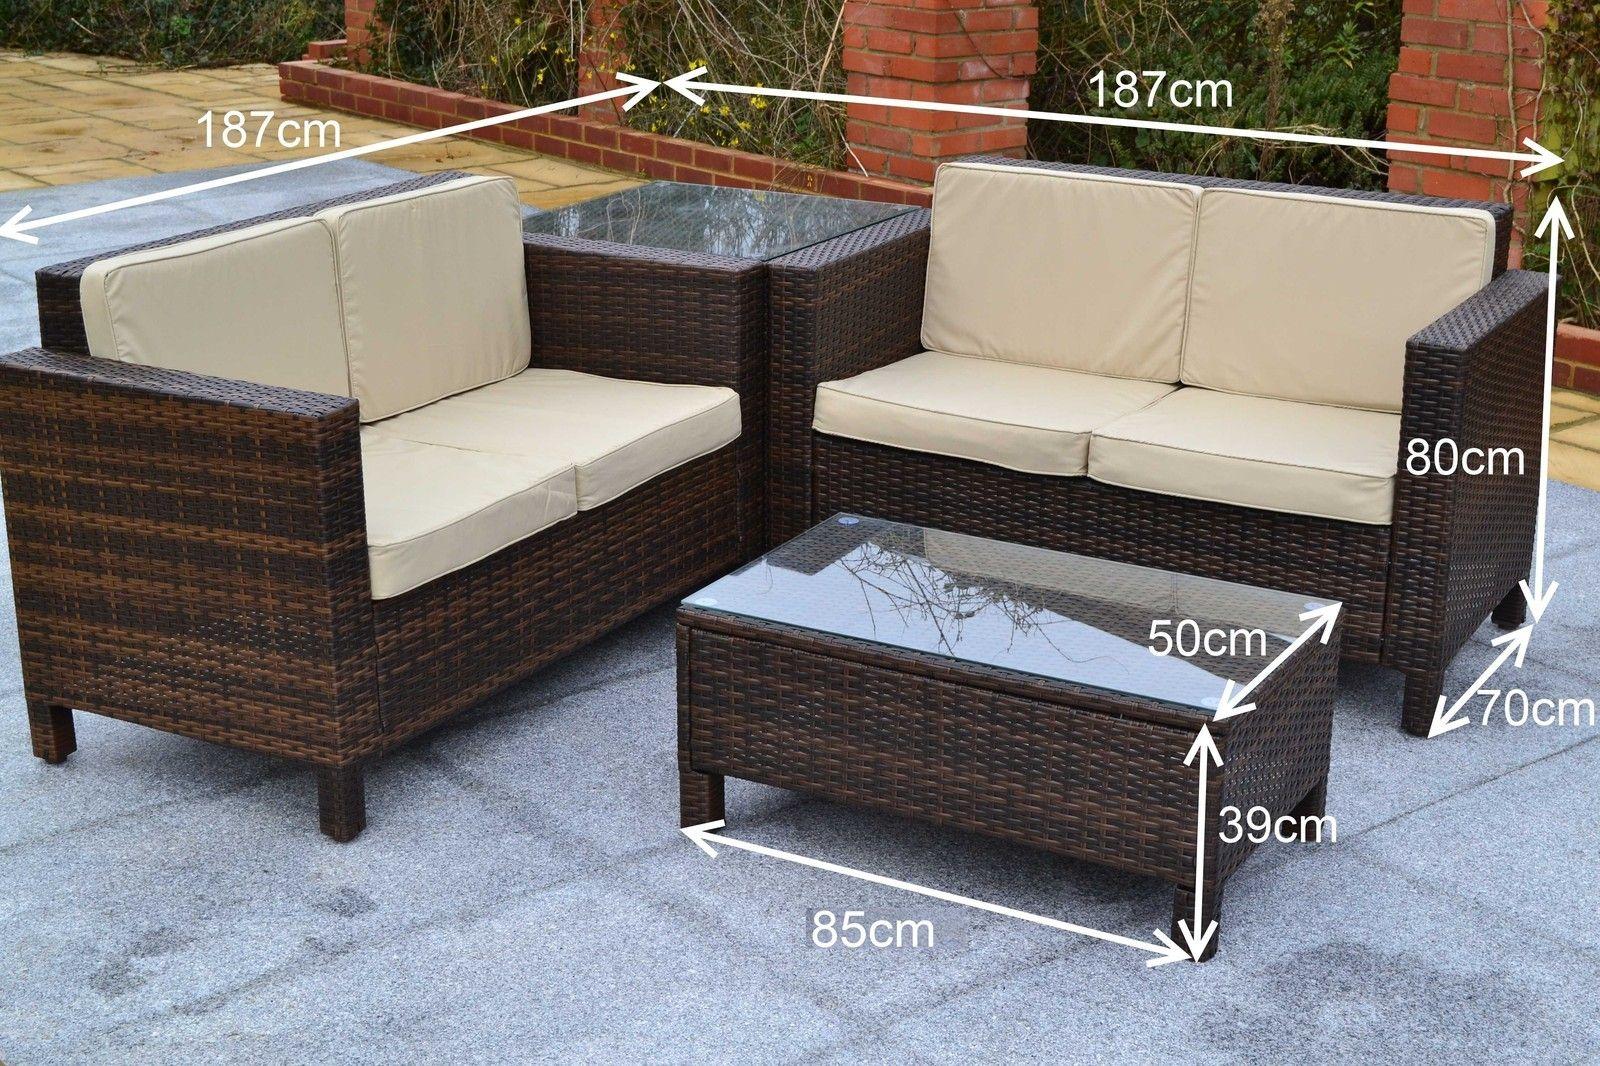 Outdoor Rattan Weave Sofa Set Garden Patio Furniture